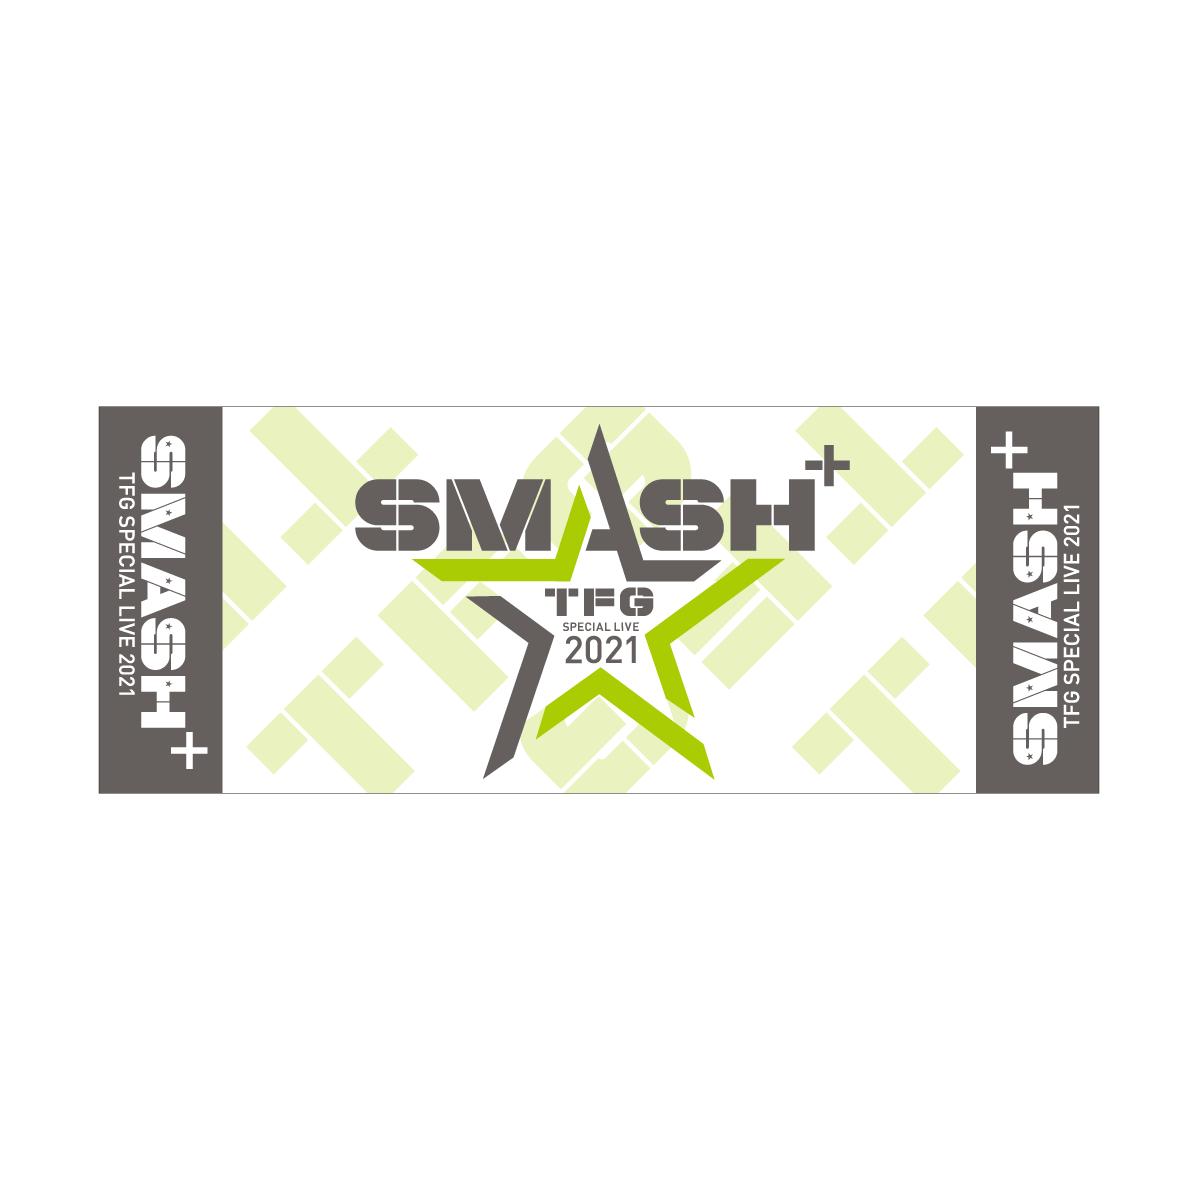 『TFGSPECIALLIVE2021-SMASH+-』フェイスタオル